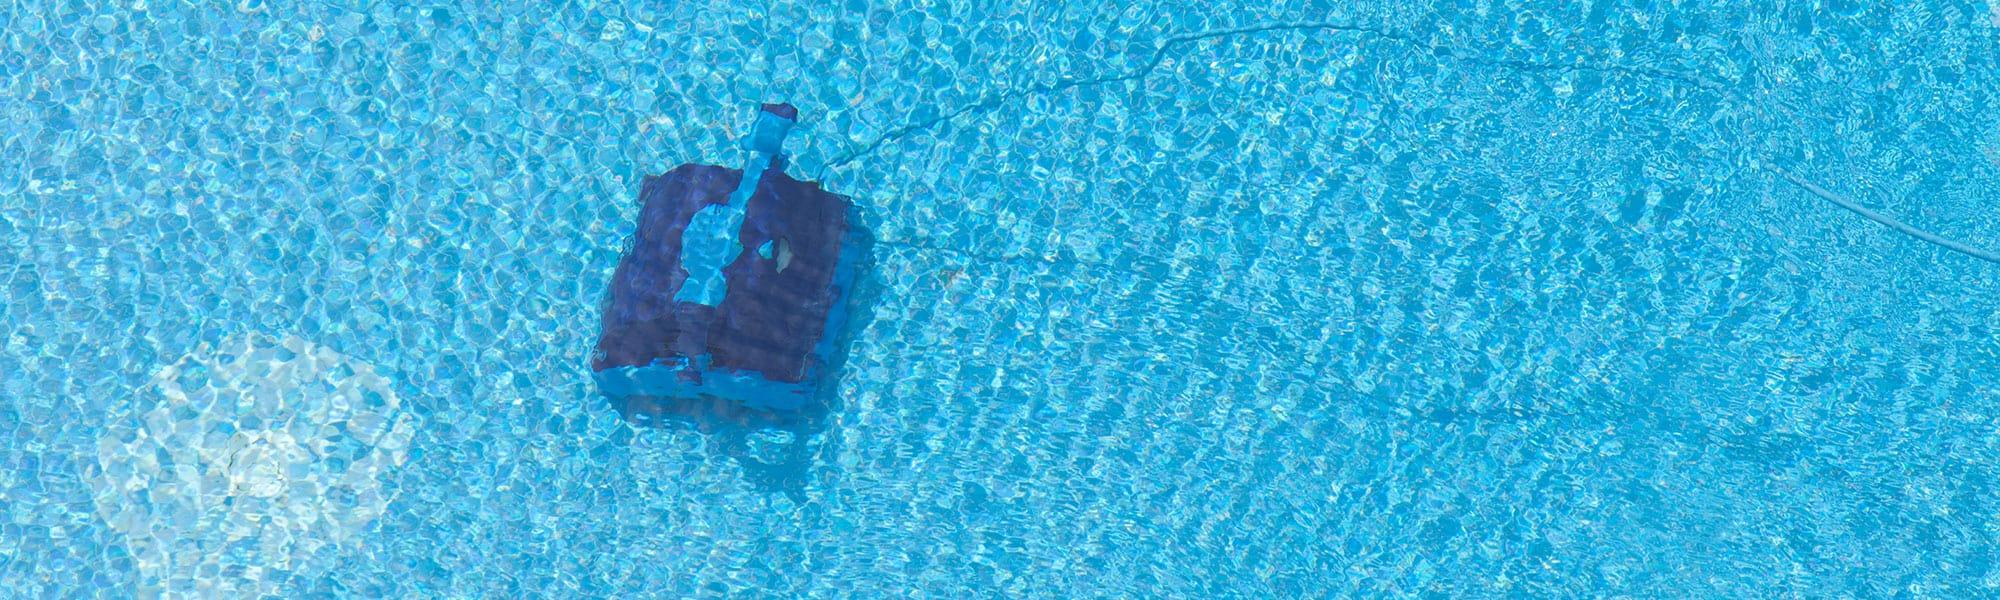 robot piscine comparatif choisir